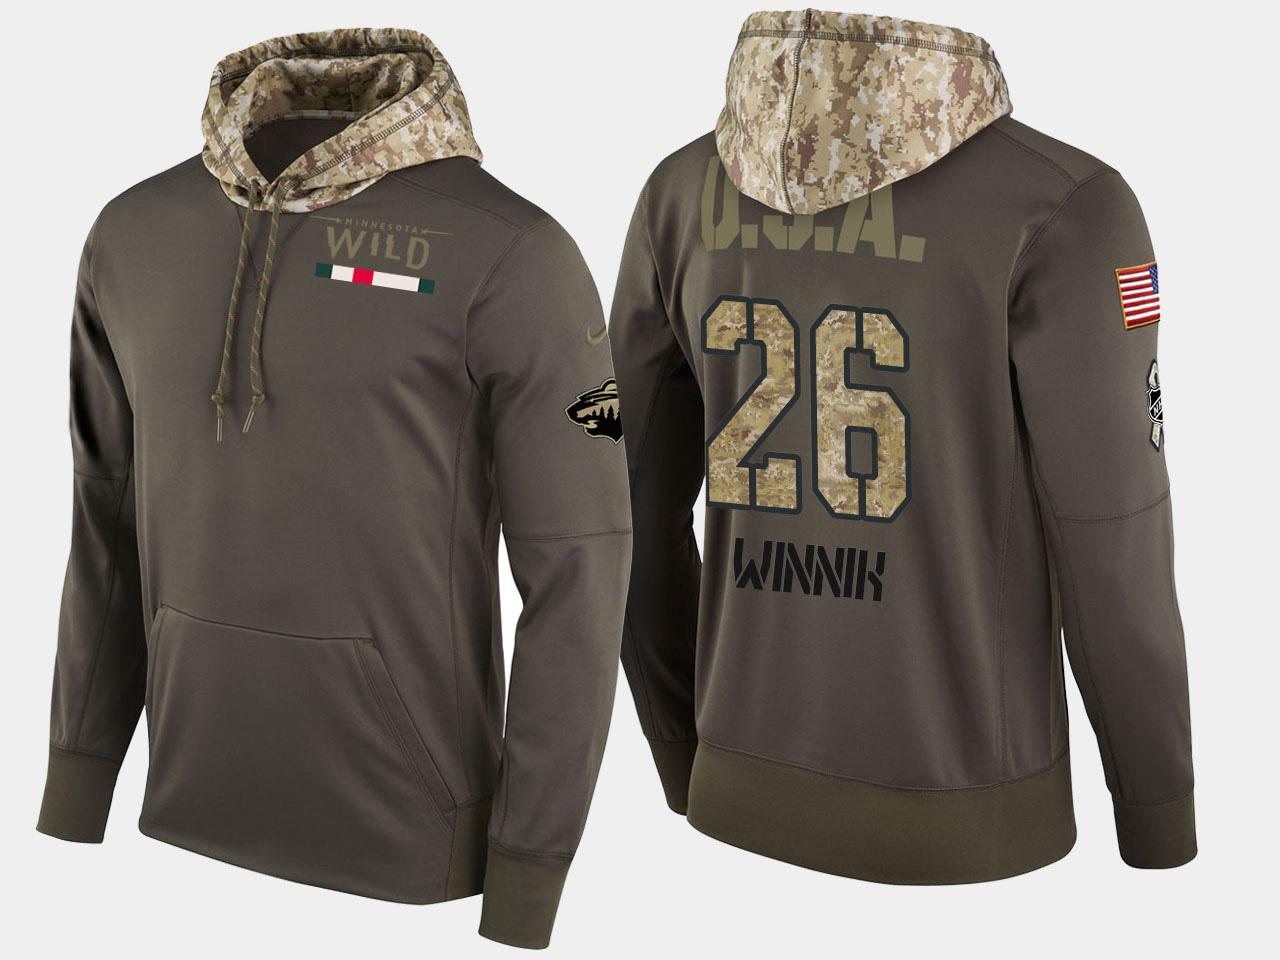 Nike Wild 26 Daniel Winnik Olive Salute To Service Pullover Hoodie